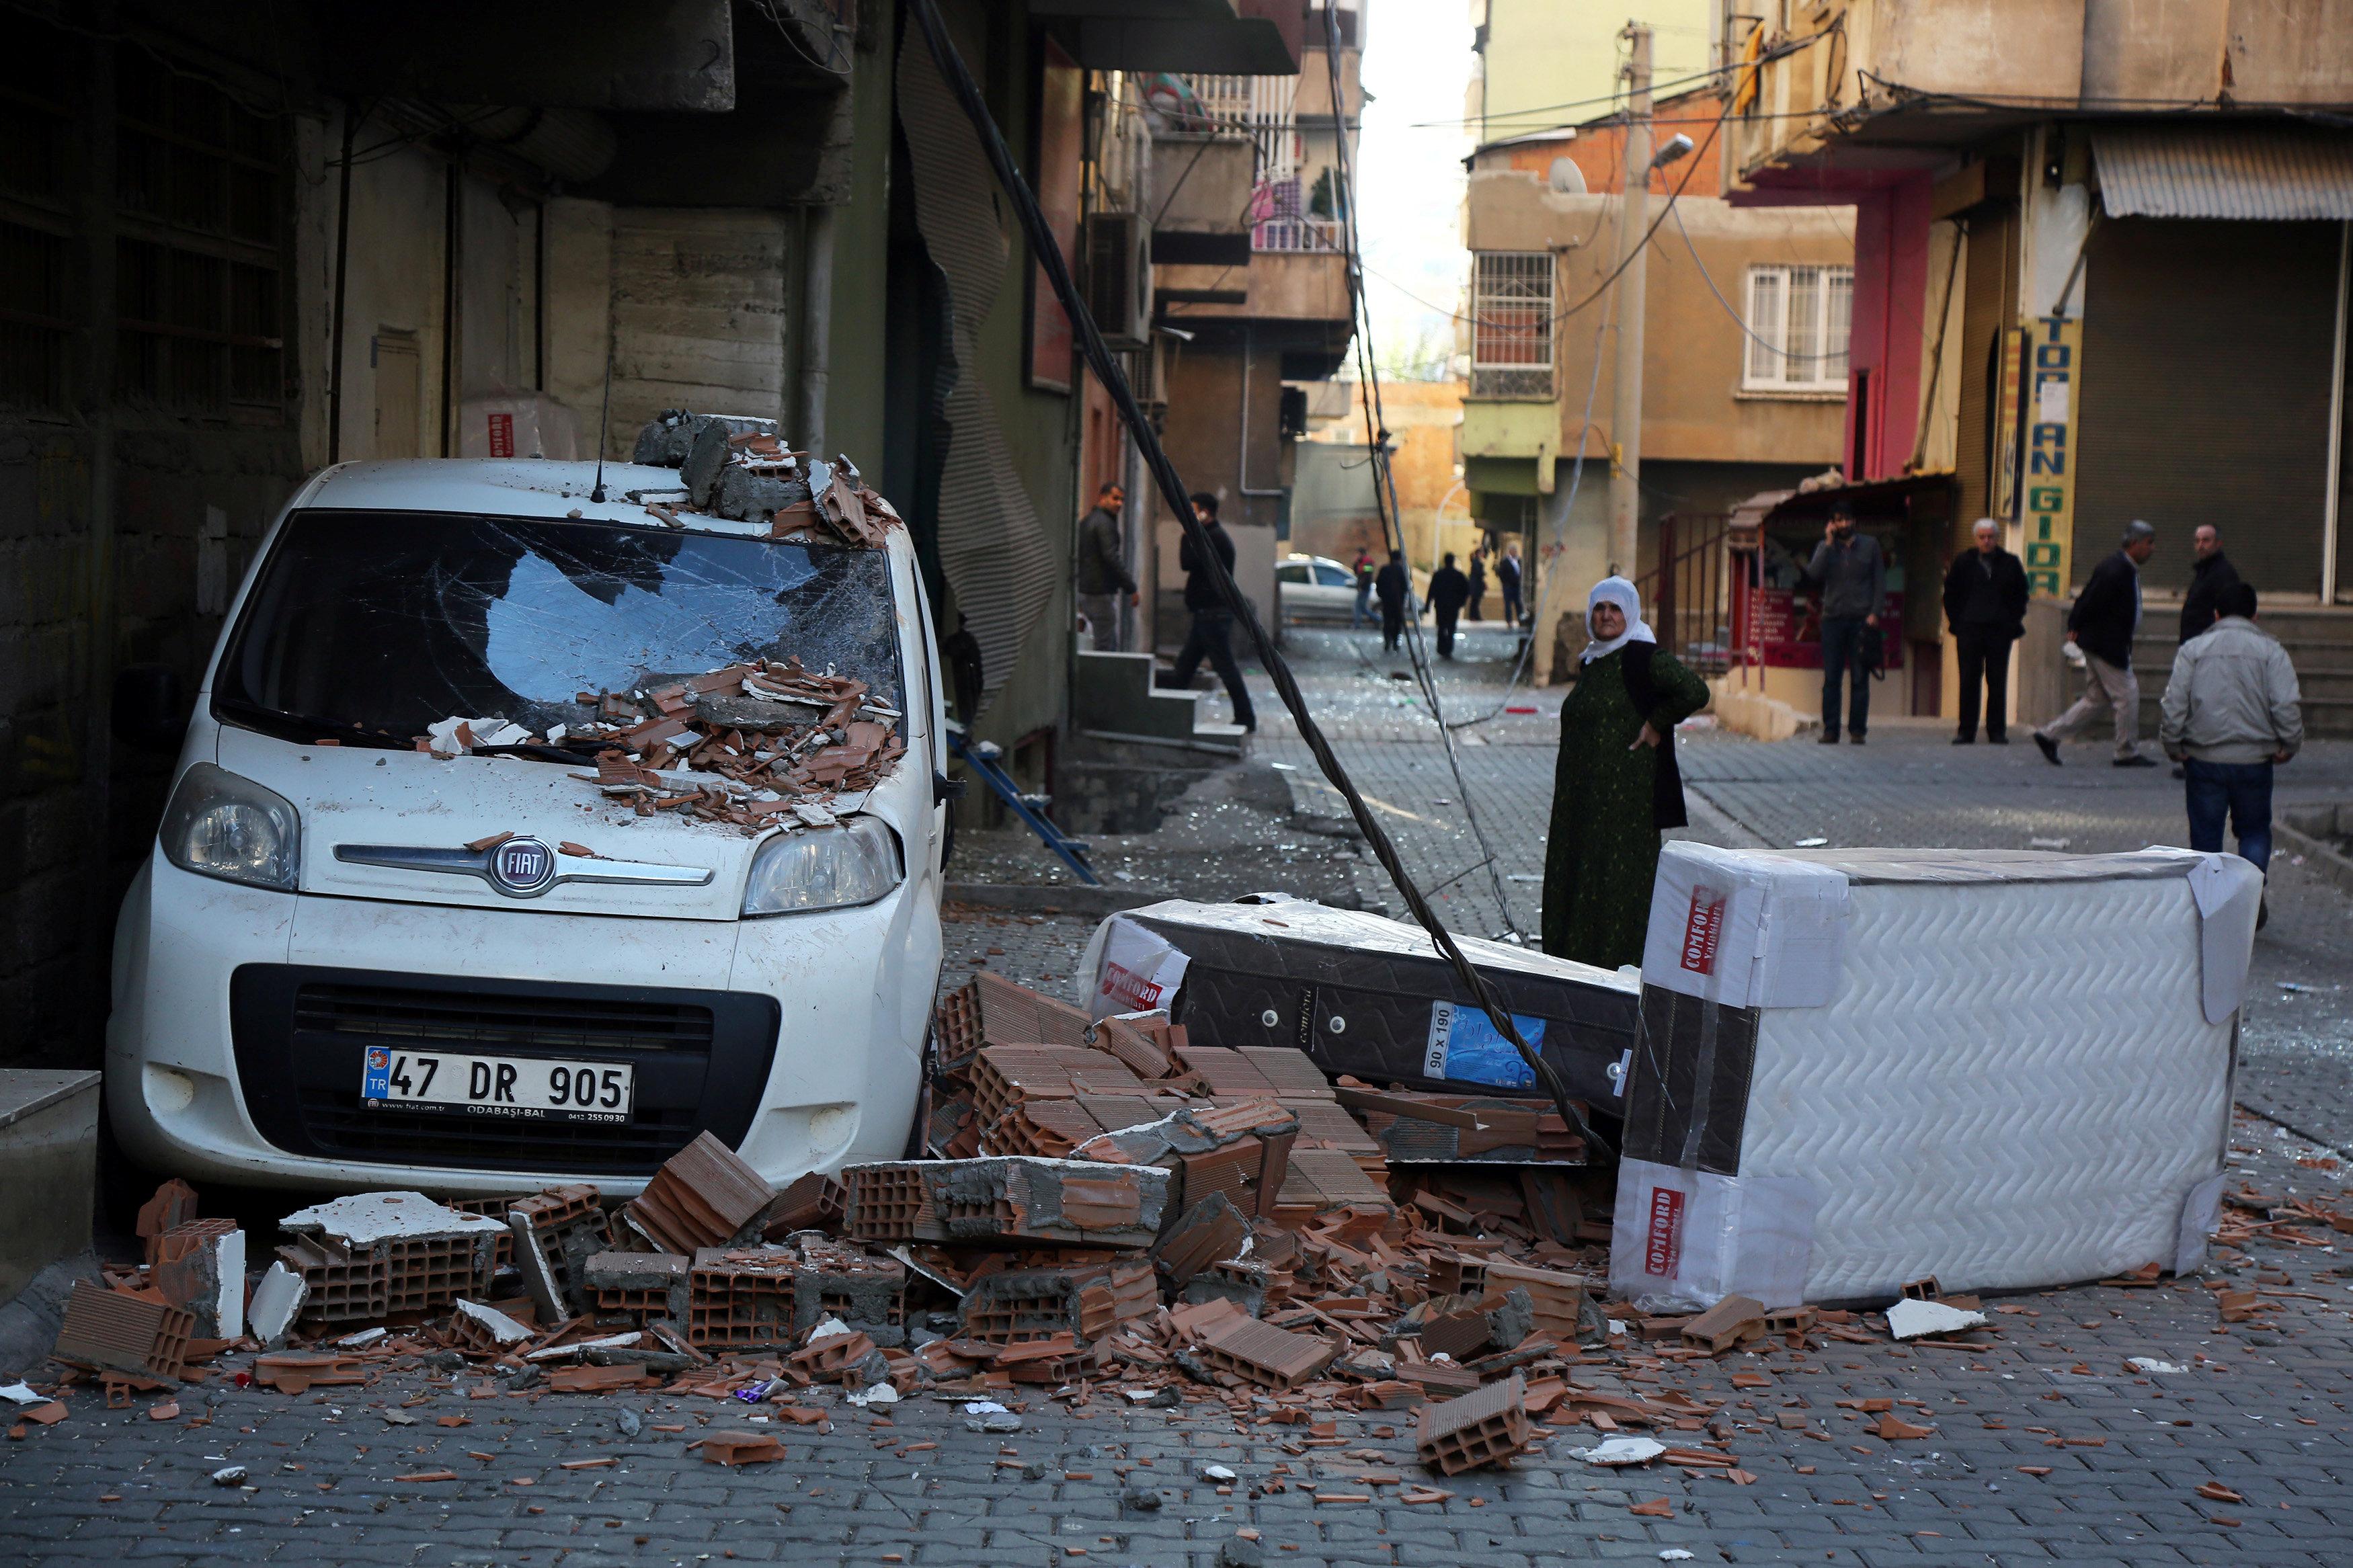 A damaged vehicle is seen after a blast in the Kurdish-dominated southeastern city of Diyarbakir, Turkey, November 4, 2016. REUTERS/Sertac Kayar